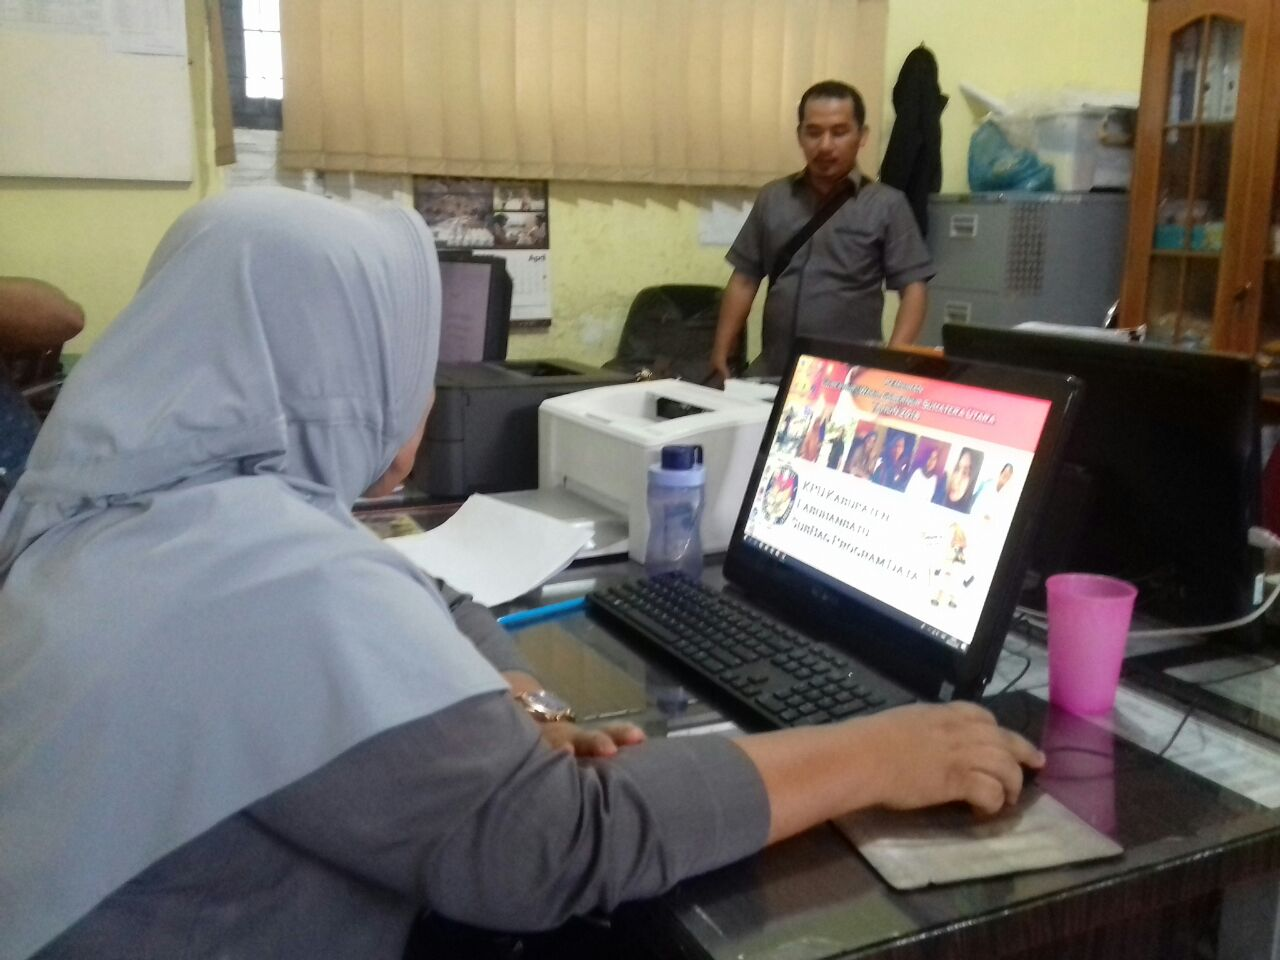 Sejumlah staf KPU Labuhanbatu sedang melakukan kegiatan sekaitan tahapan Pilgub Sumut.